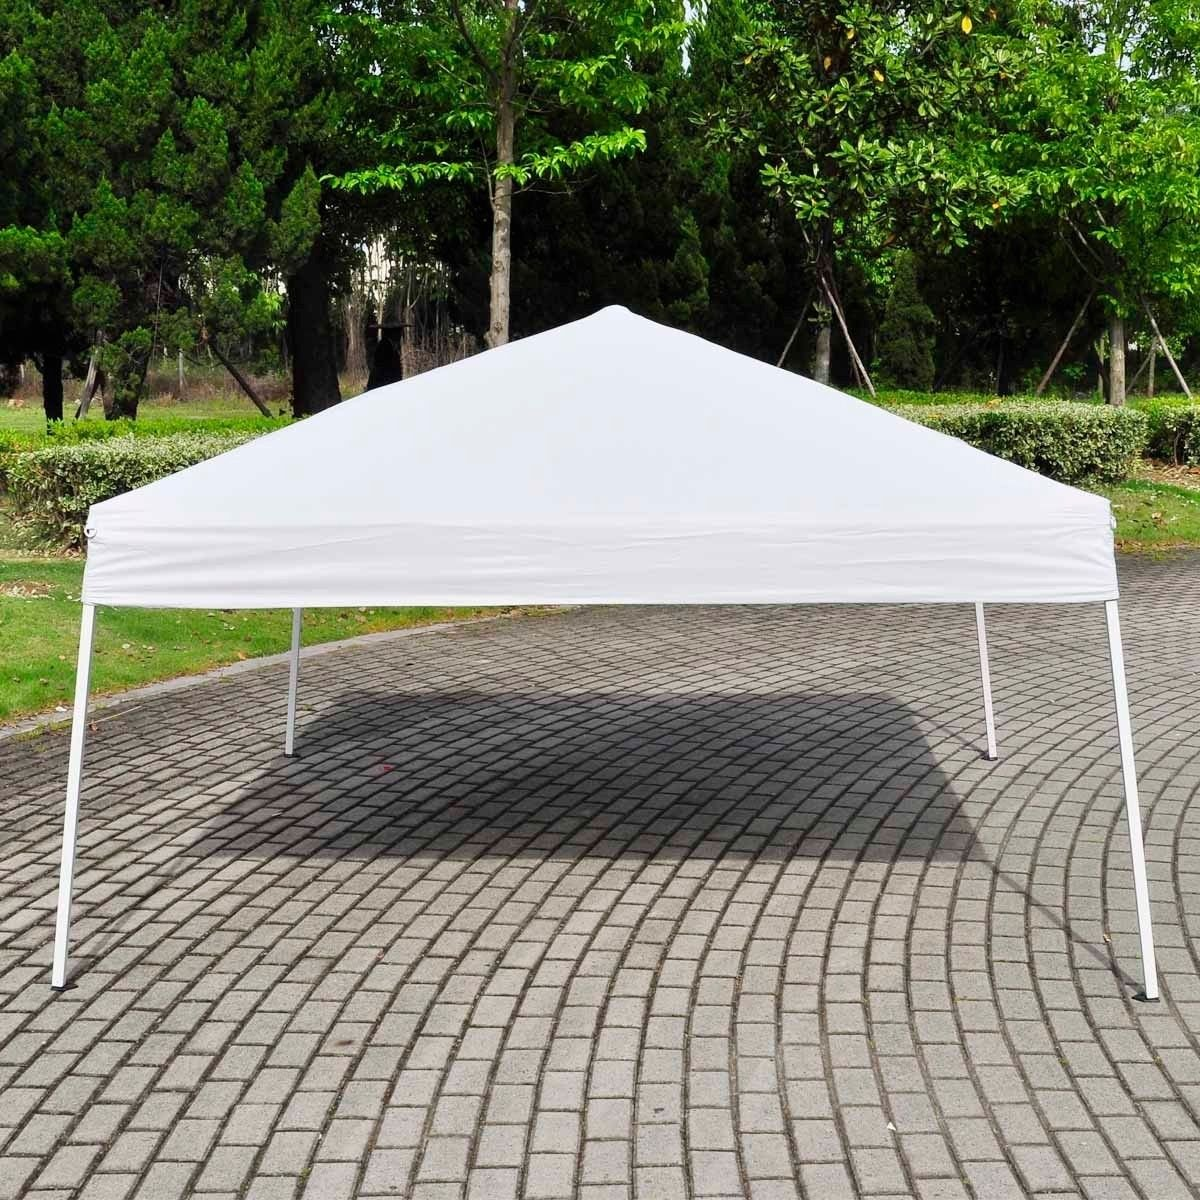 Amazon.com  STRONG CAMEL EZ POP UP Wedding Party Tent 10u0027x10u0027 Folding Gazebo Beach Canopy W/Carry Bag-WHITE  Sports Fan Canopies  Garden u0026 Outdoor & Amazon.com : STRONG CAMEL EZ POP UP Wedding Party Tent 10u0027x10 ...